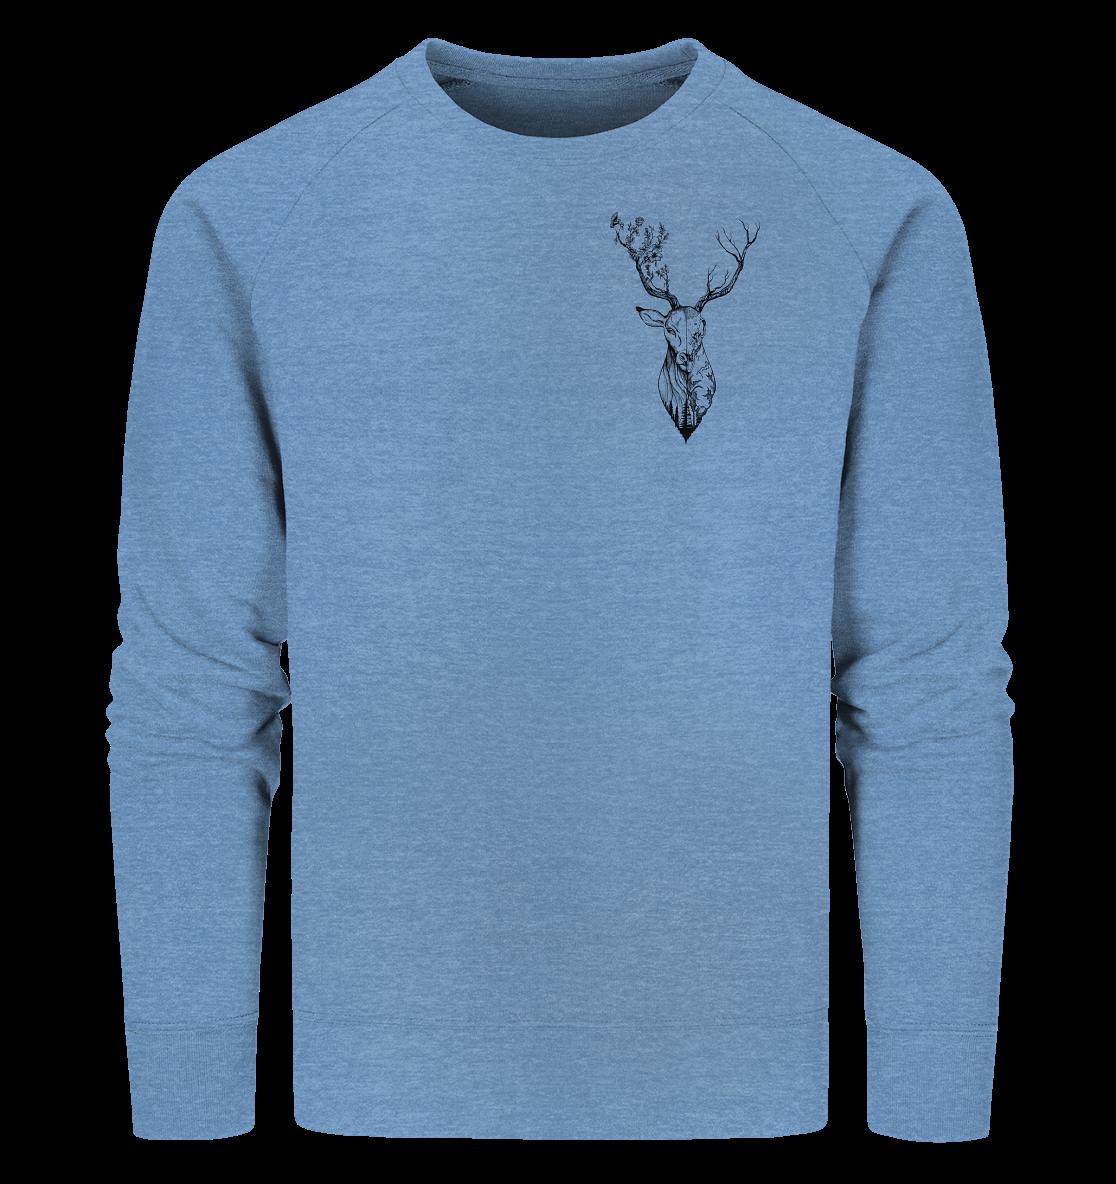 front-organic-sweatshirt-6090c4-1116x-7.png